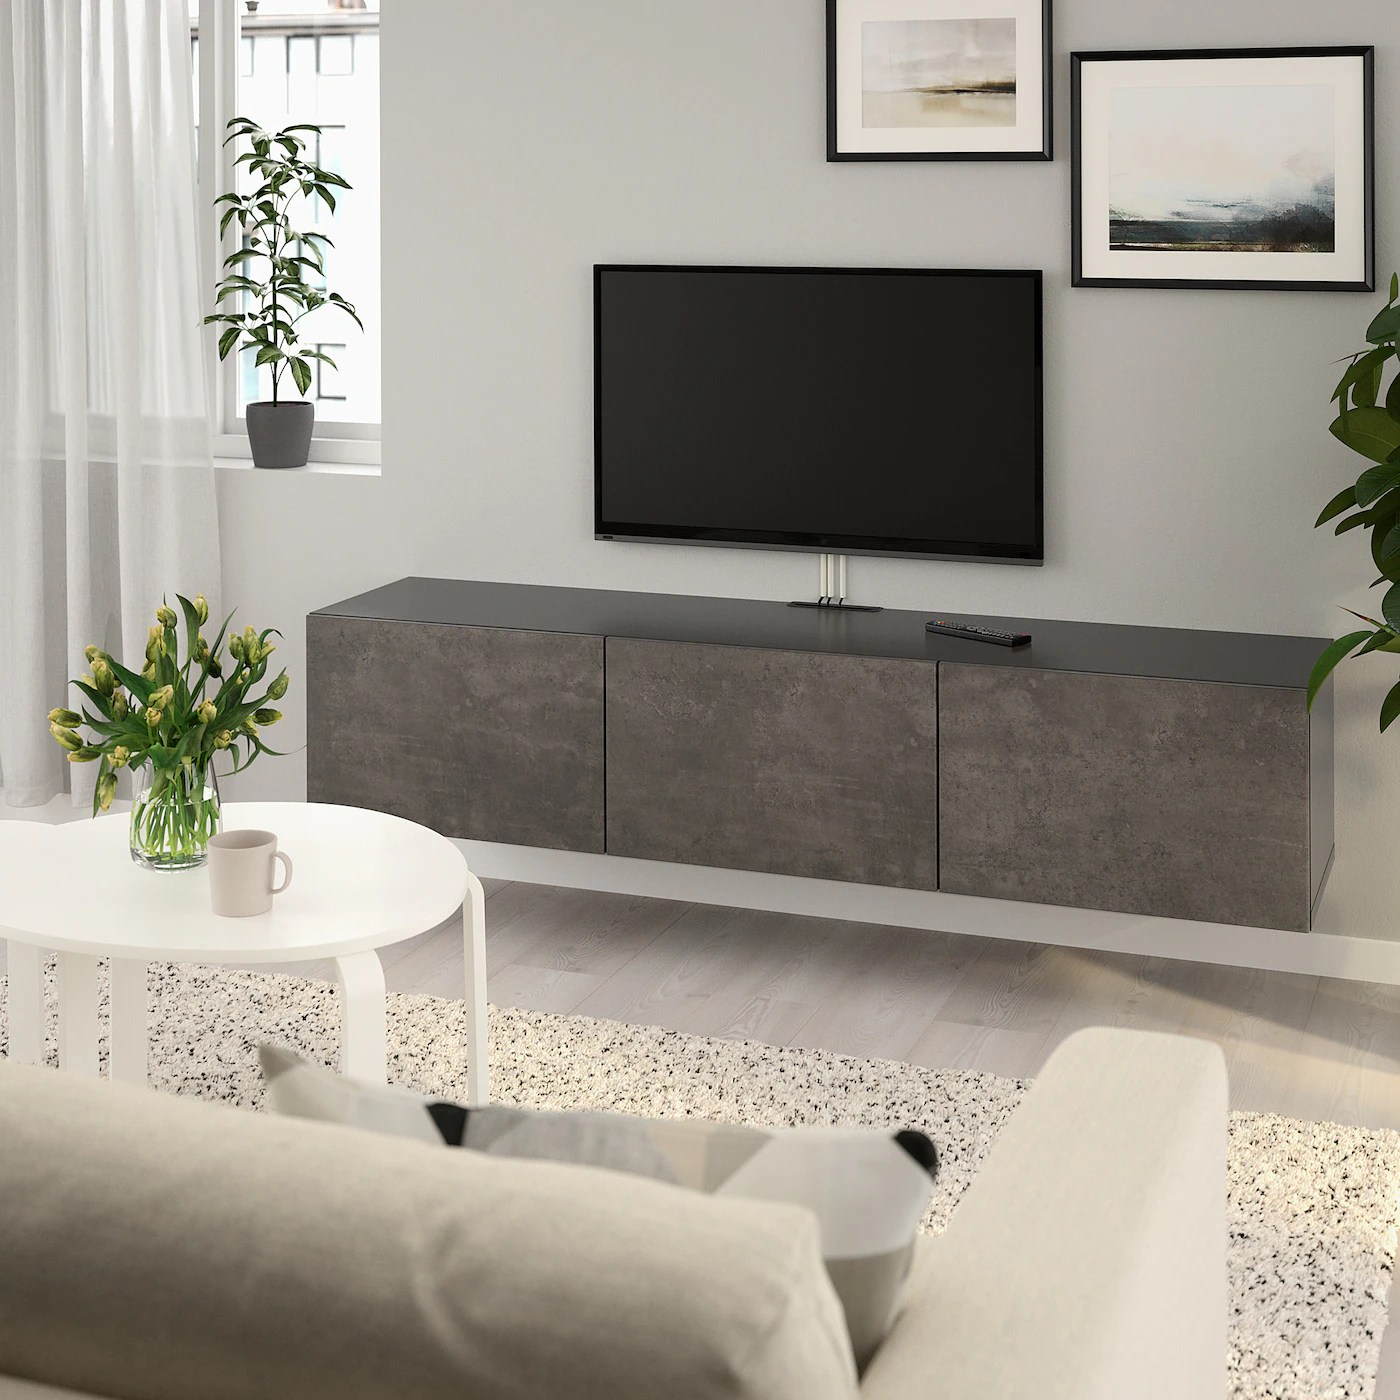 Besta Banc Tv Avec Portes Brun Noir Kallviken Imitation Ciment Ikea